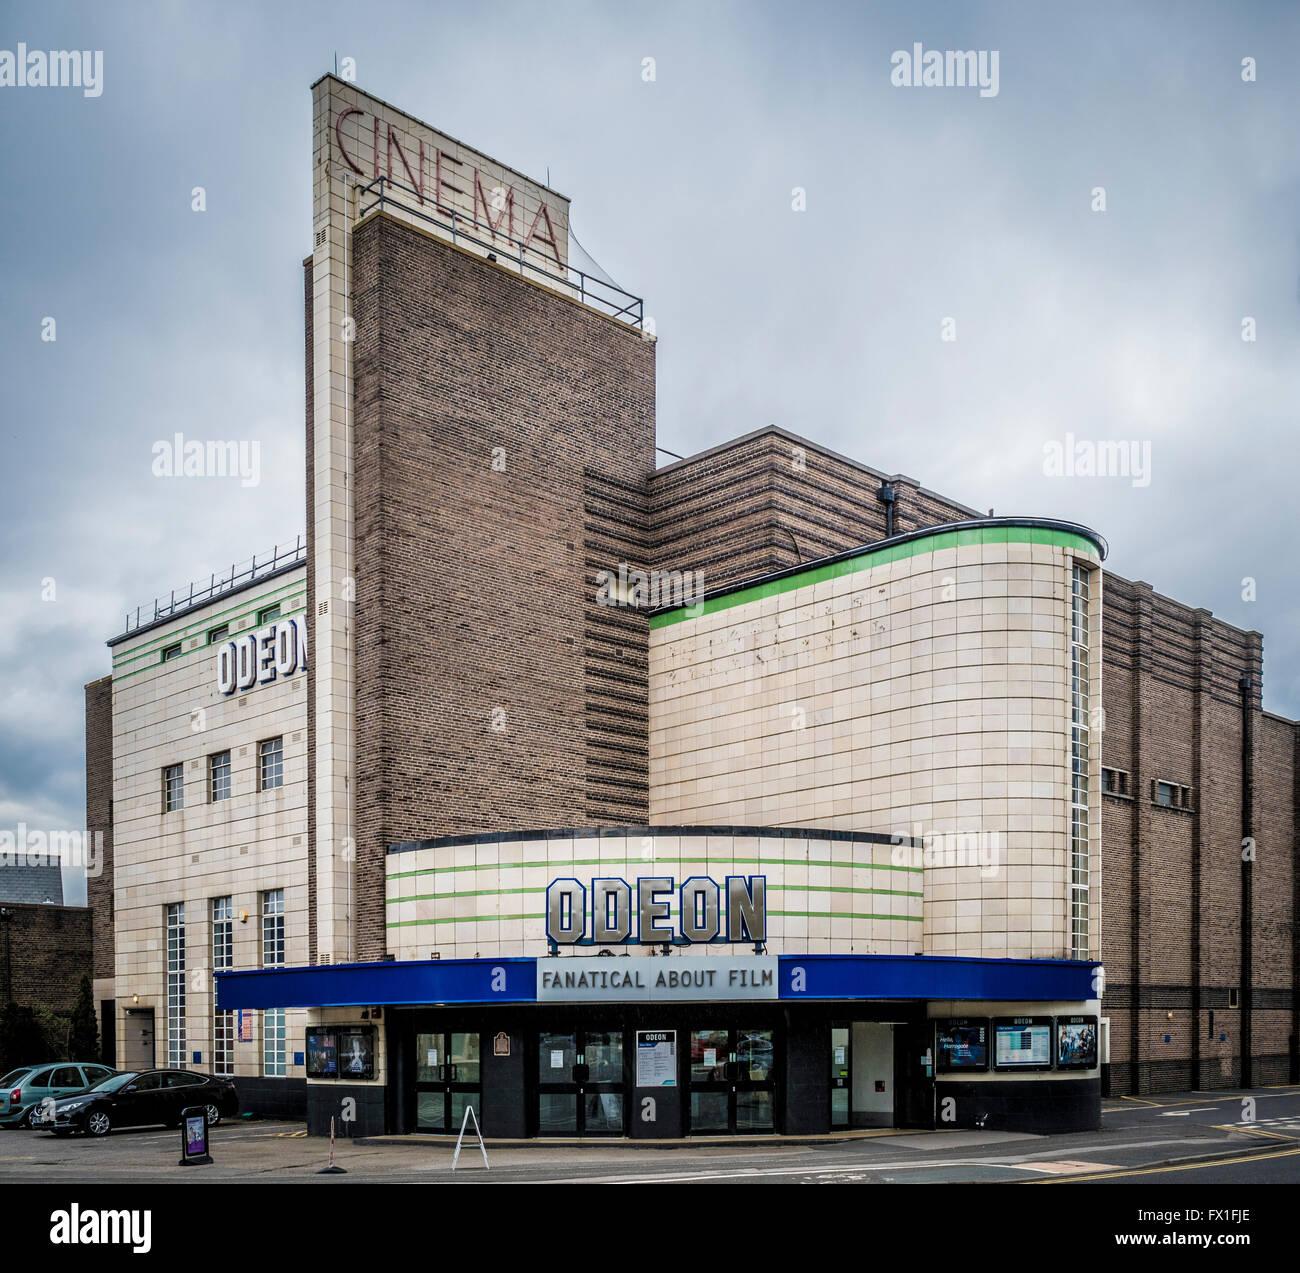 Art Deco Odeon Cinema building, Harrogate, North Yorkshire, UK. - Stock Image